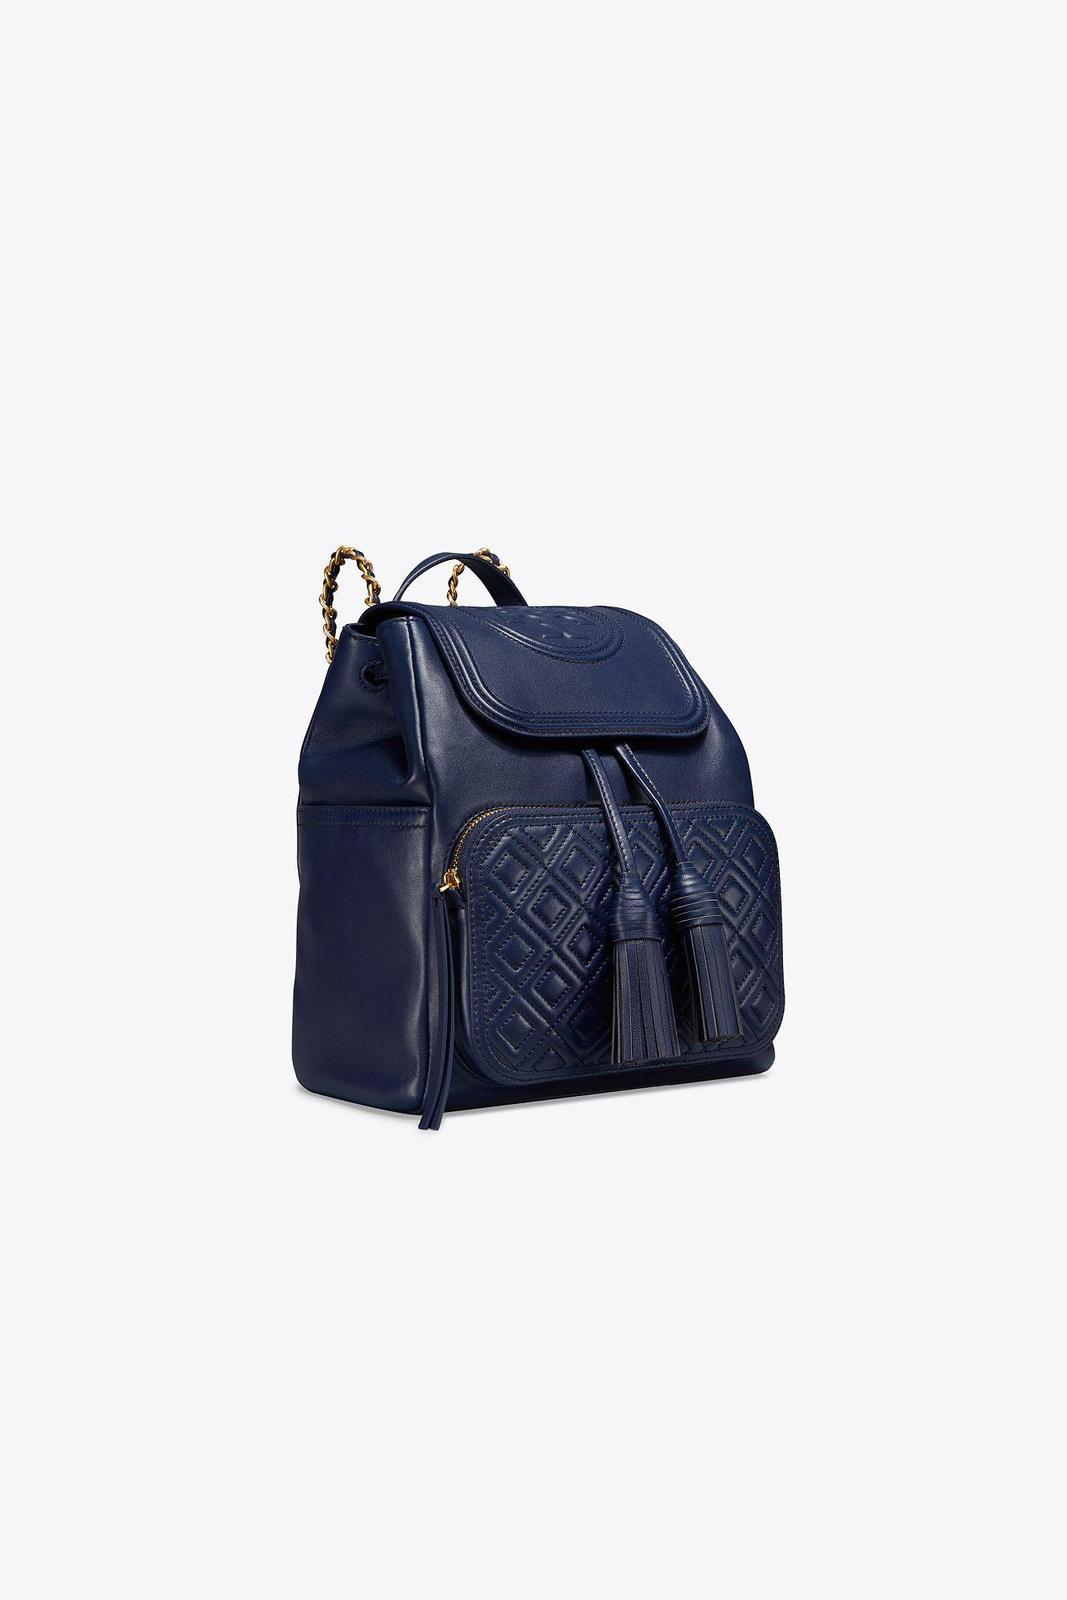 c824b6044aa Tory Burch Fleming Backpack ( 558)- Royal and 50 similar items